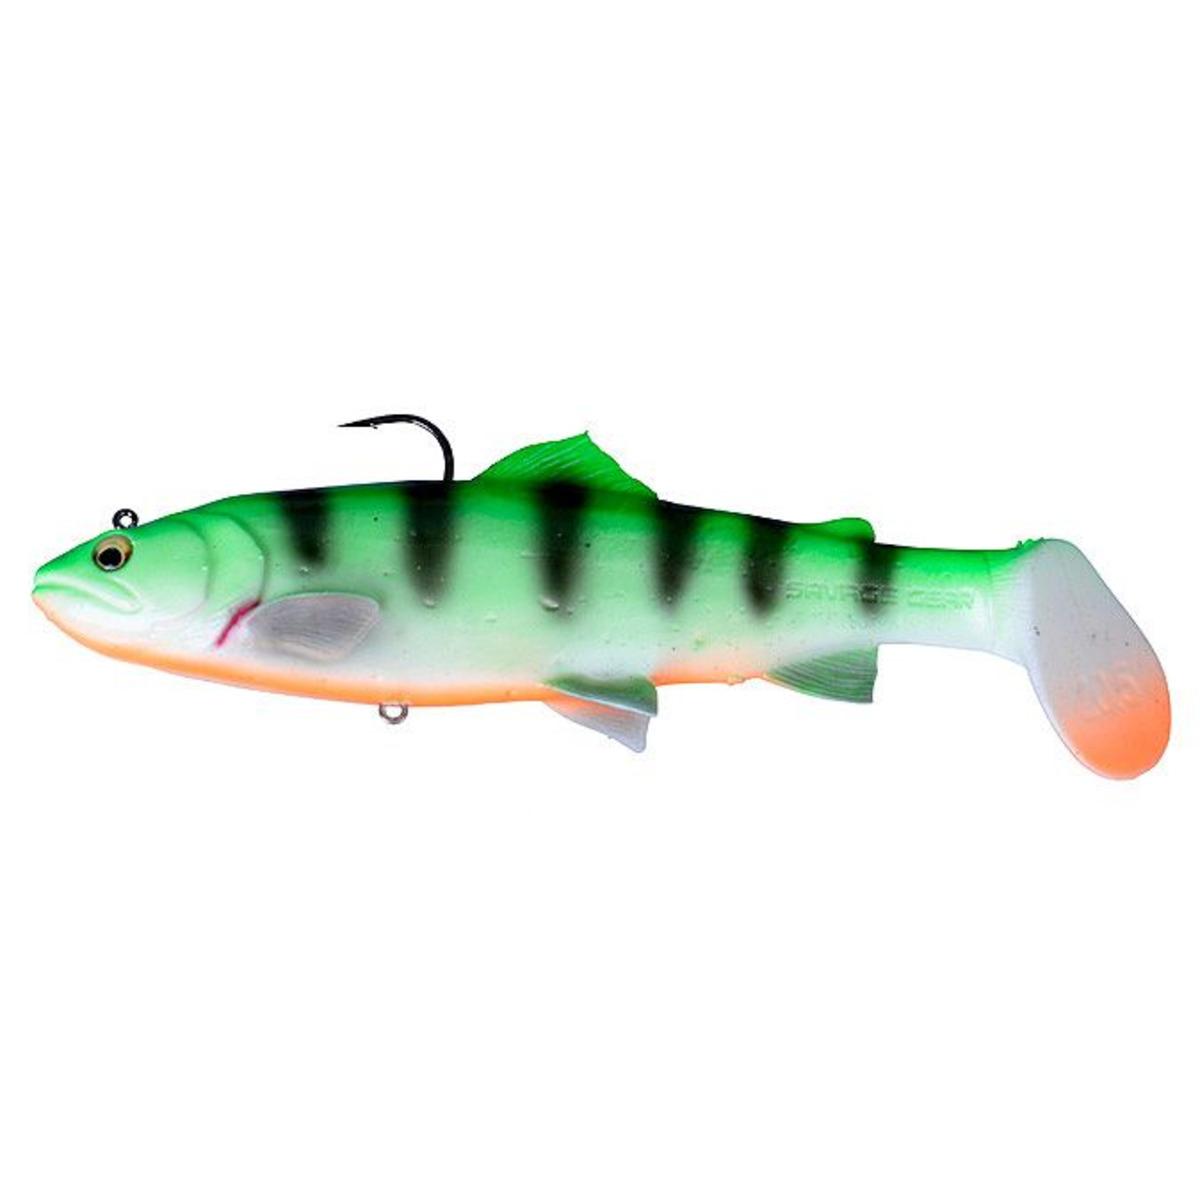 Savage Gear 3D Trout Rattle Shad - 20.5 cm - 120 g - Firetiger